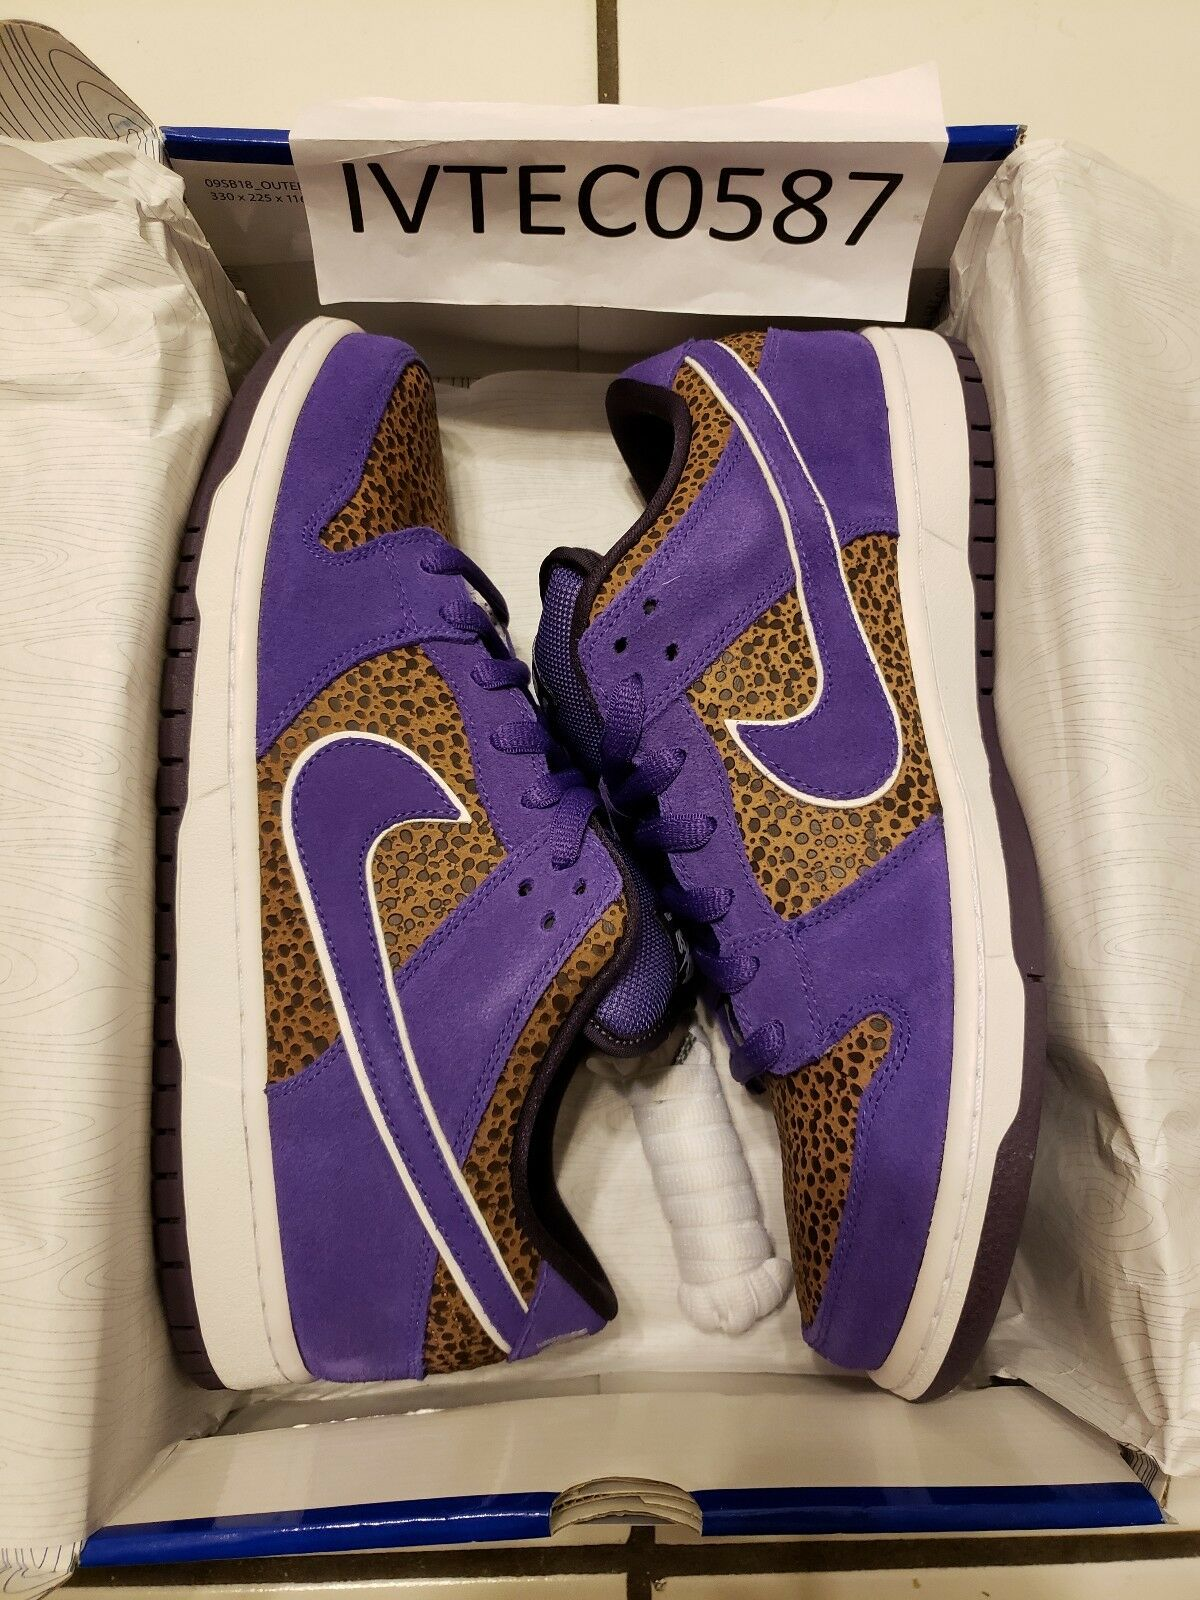 Nike Sb Kenny Powers Safari Purple Mens Size 10.5 Beasly Bison Dunk Cheetah Low